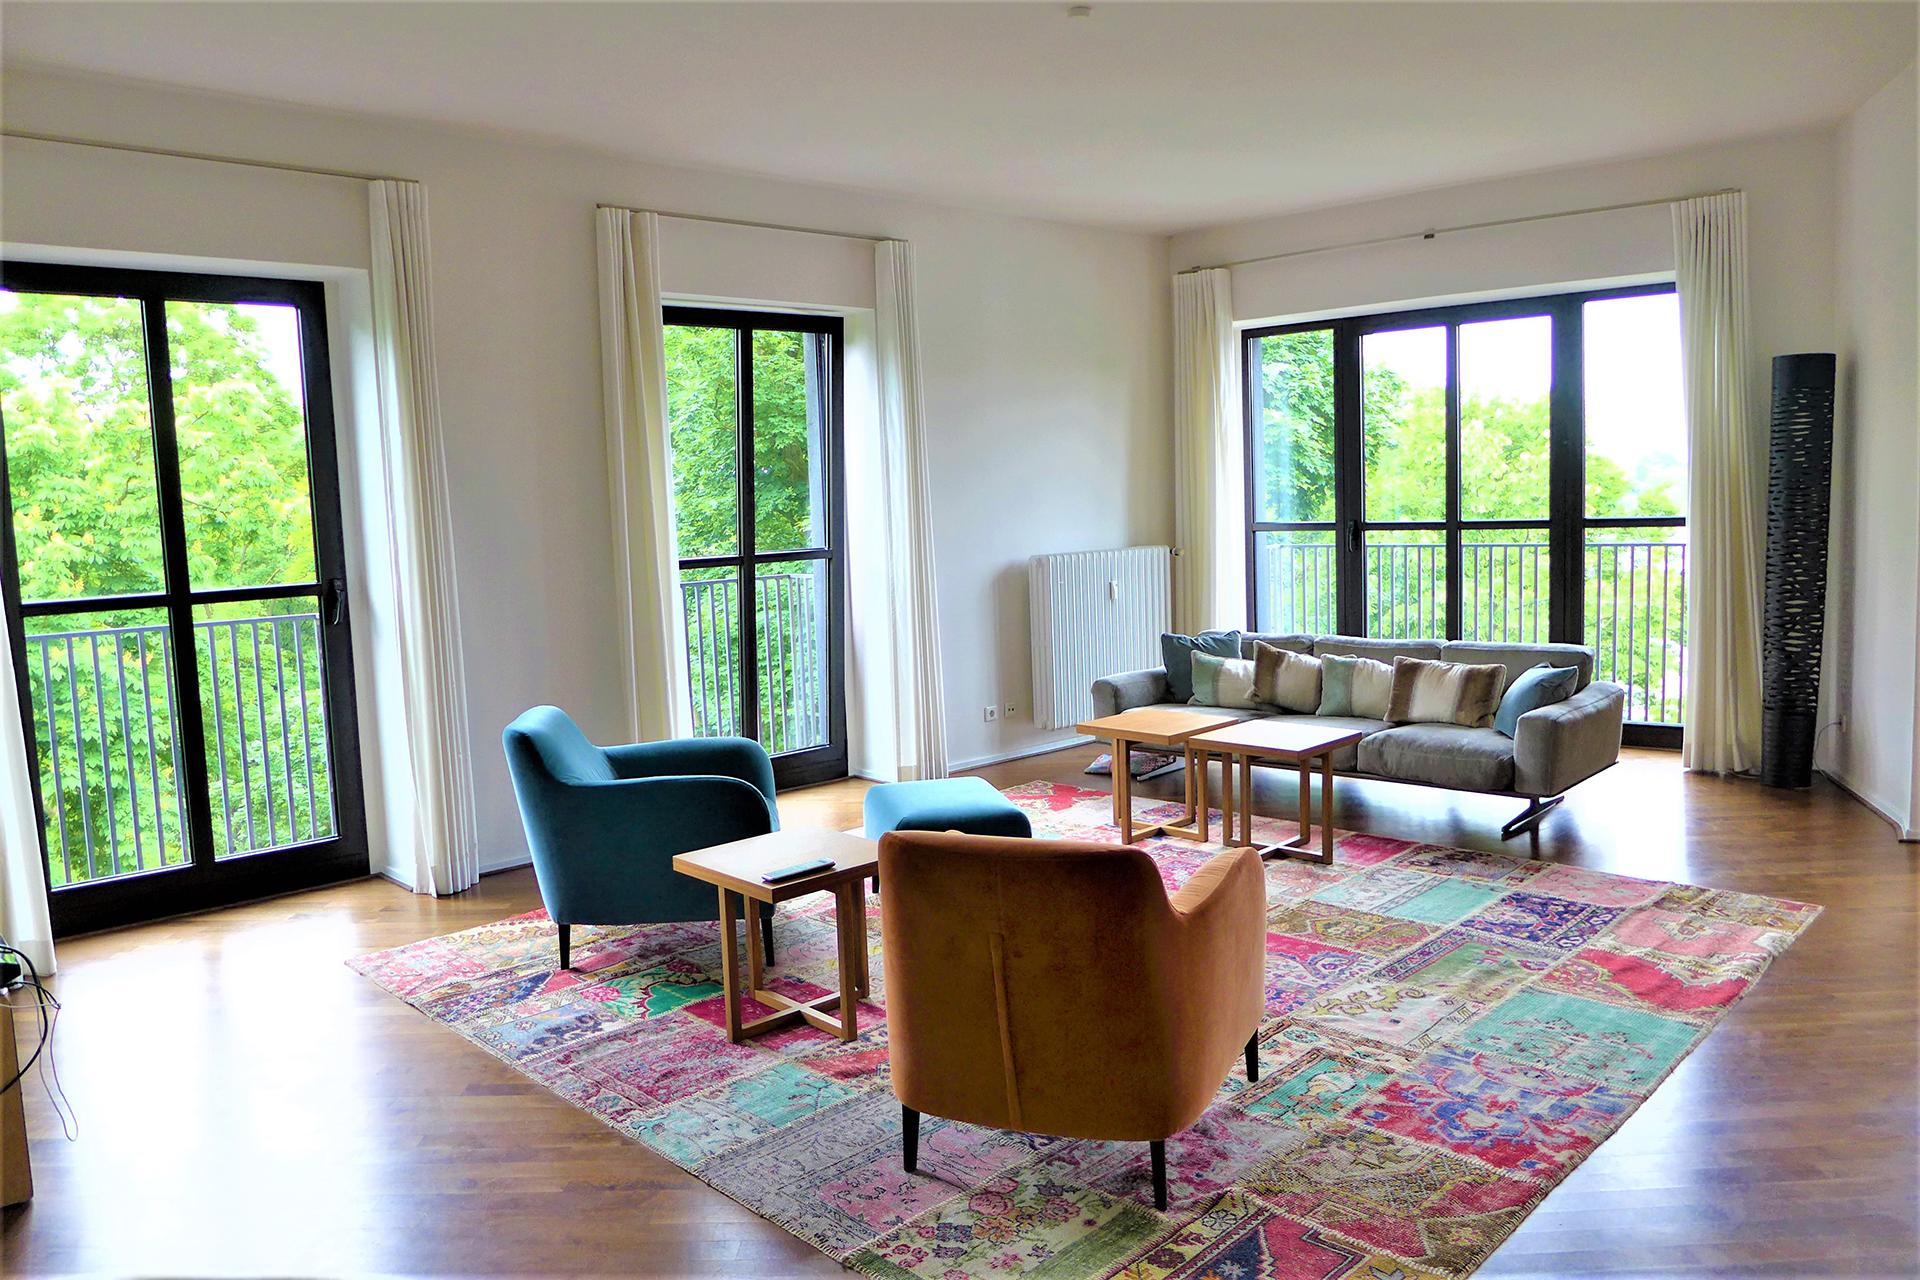 5-Zimmer-Wohnung   Am Hofgarten